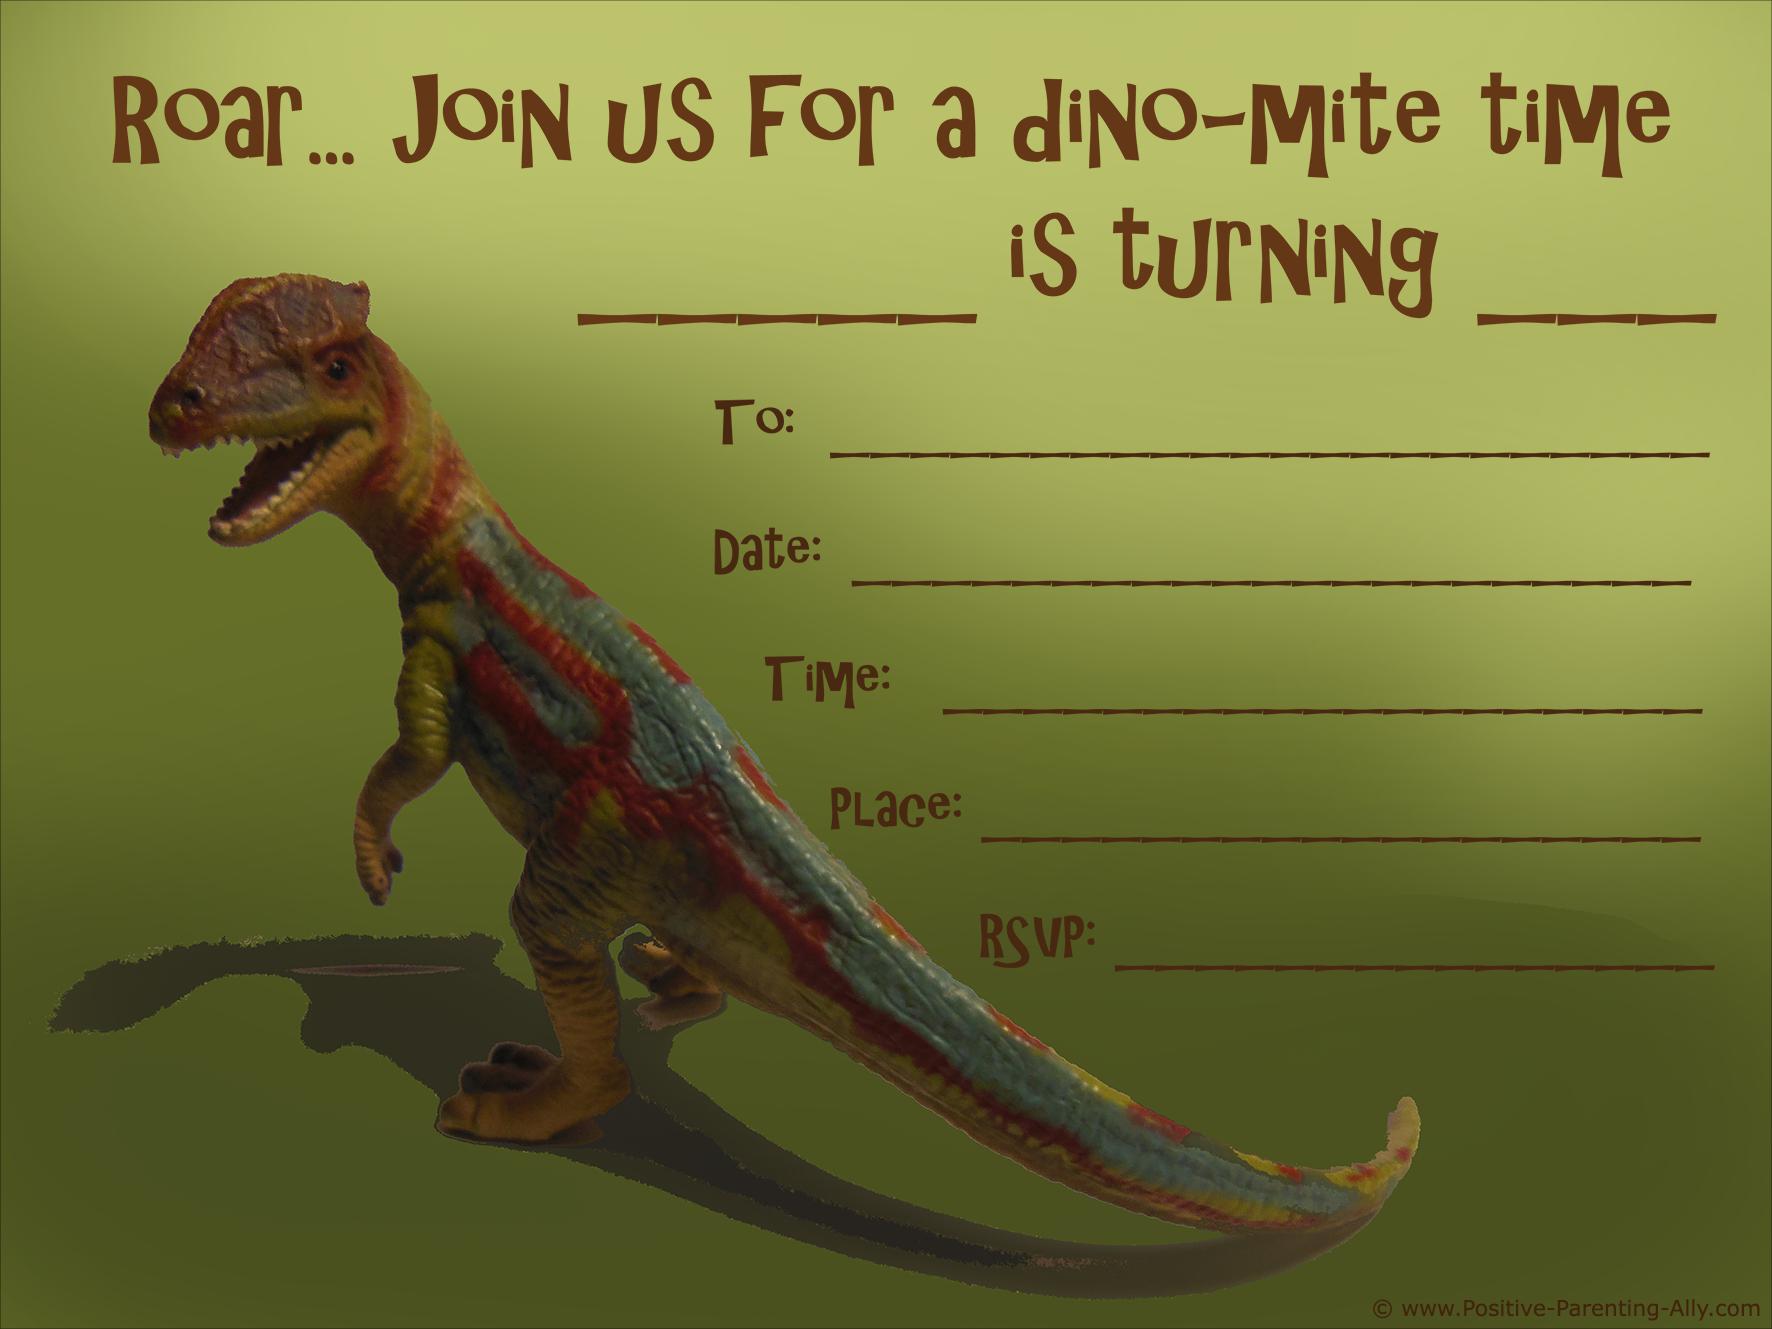 Dinosaur birthday invitations: Realistic dinosaur on birthday invitation for boys.